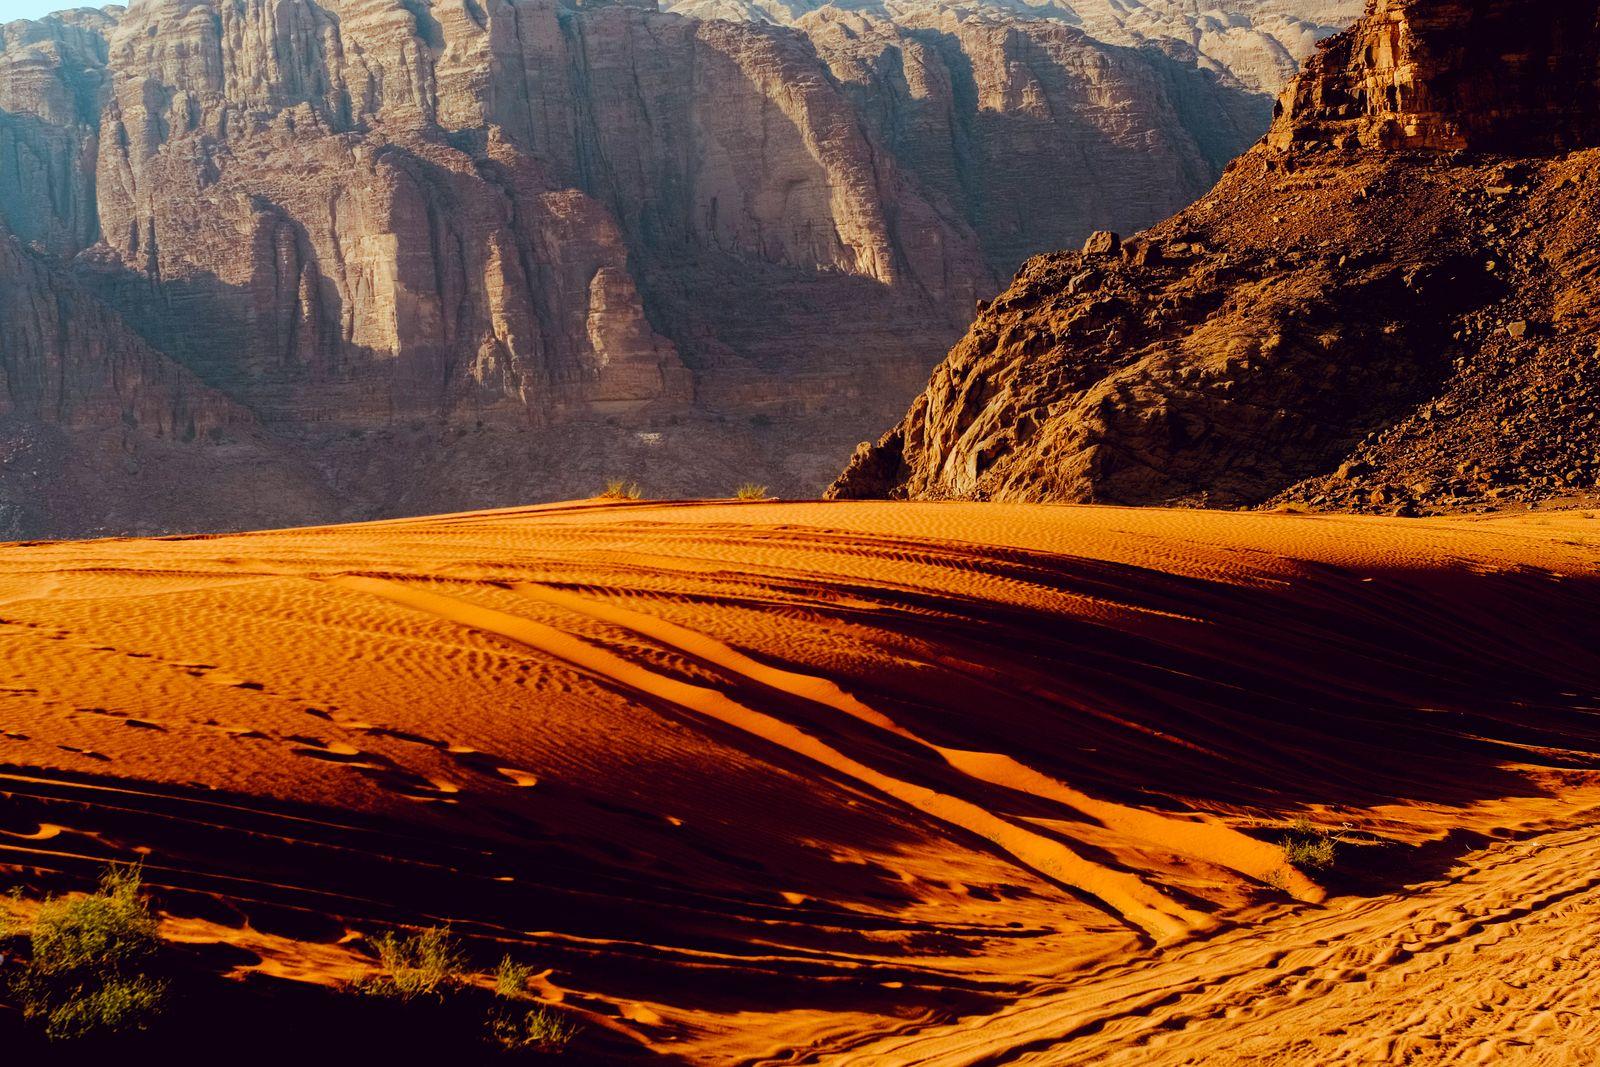 Sunset across the sand dunes and mountains of Wadi Rum, Jordan Wadi Rum Village, Aqaba Governorate, Jordan PUBLICATIONxI